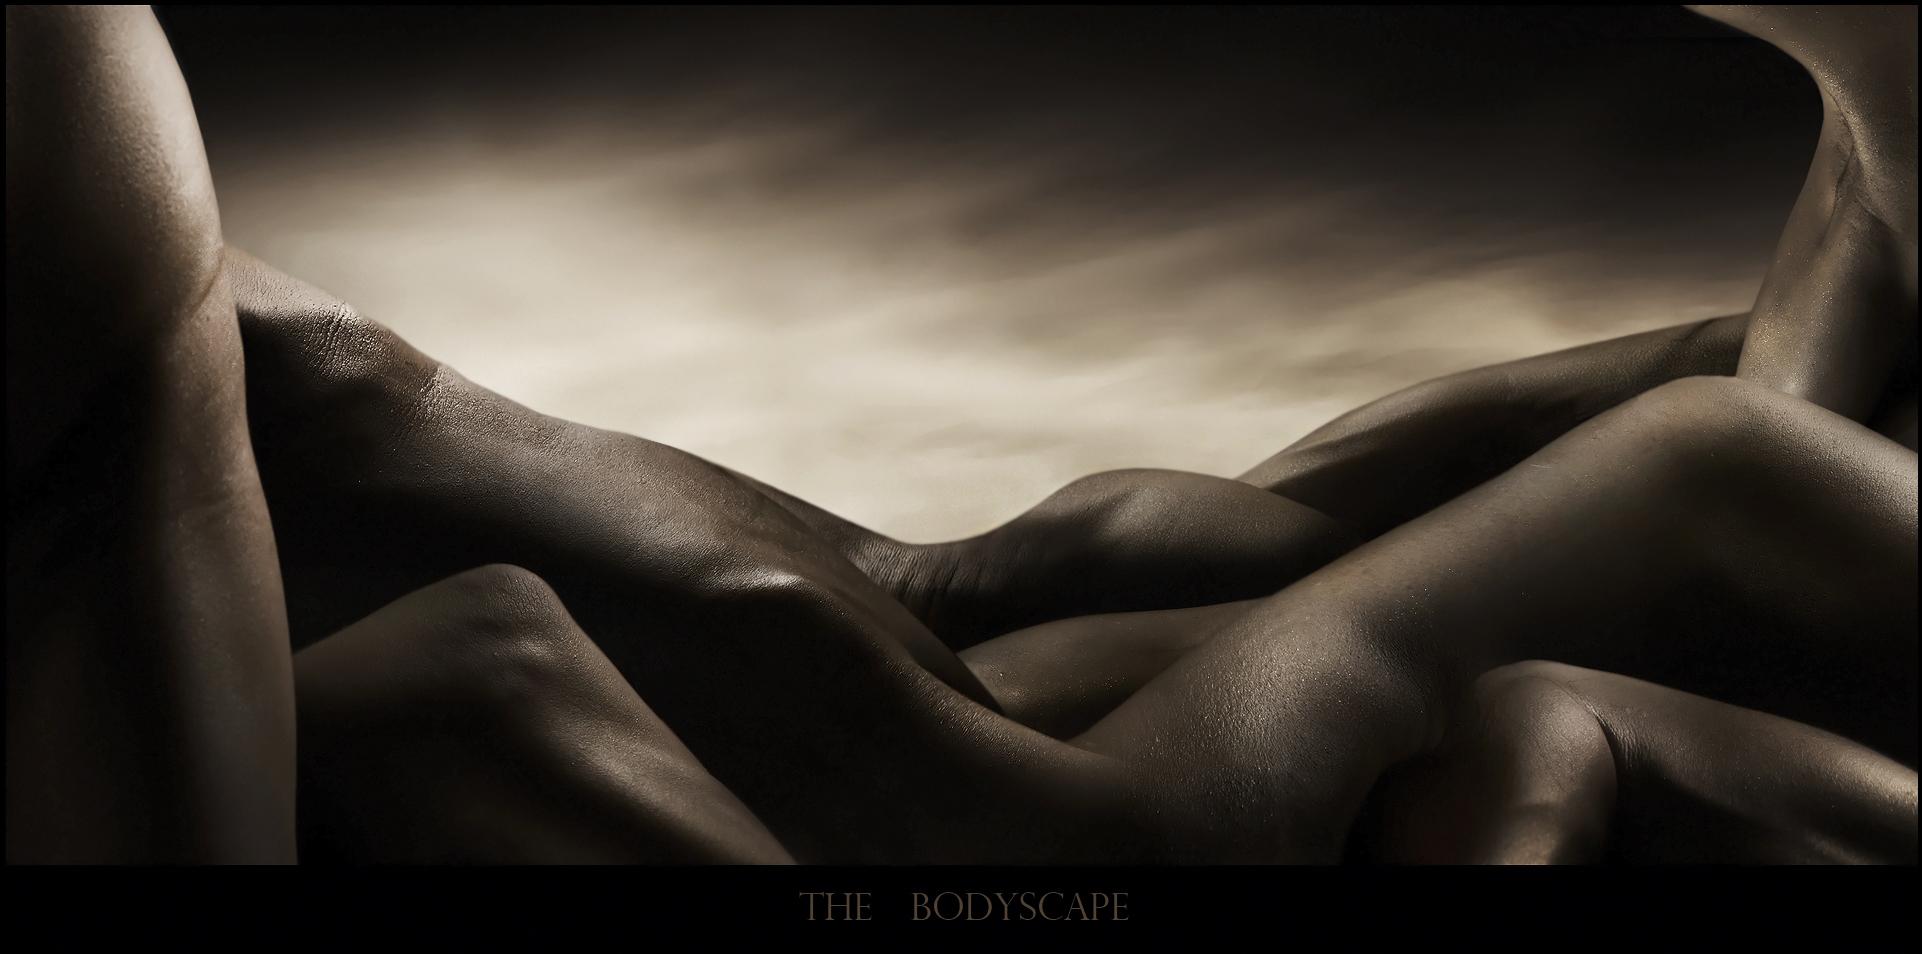 The bodyscape